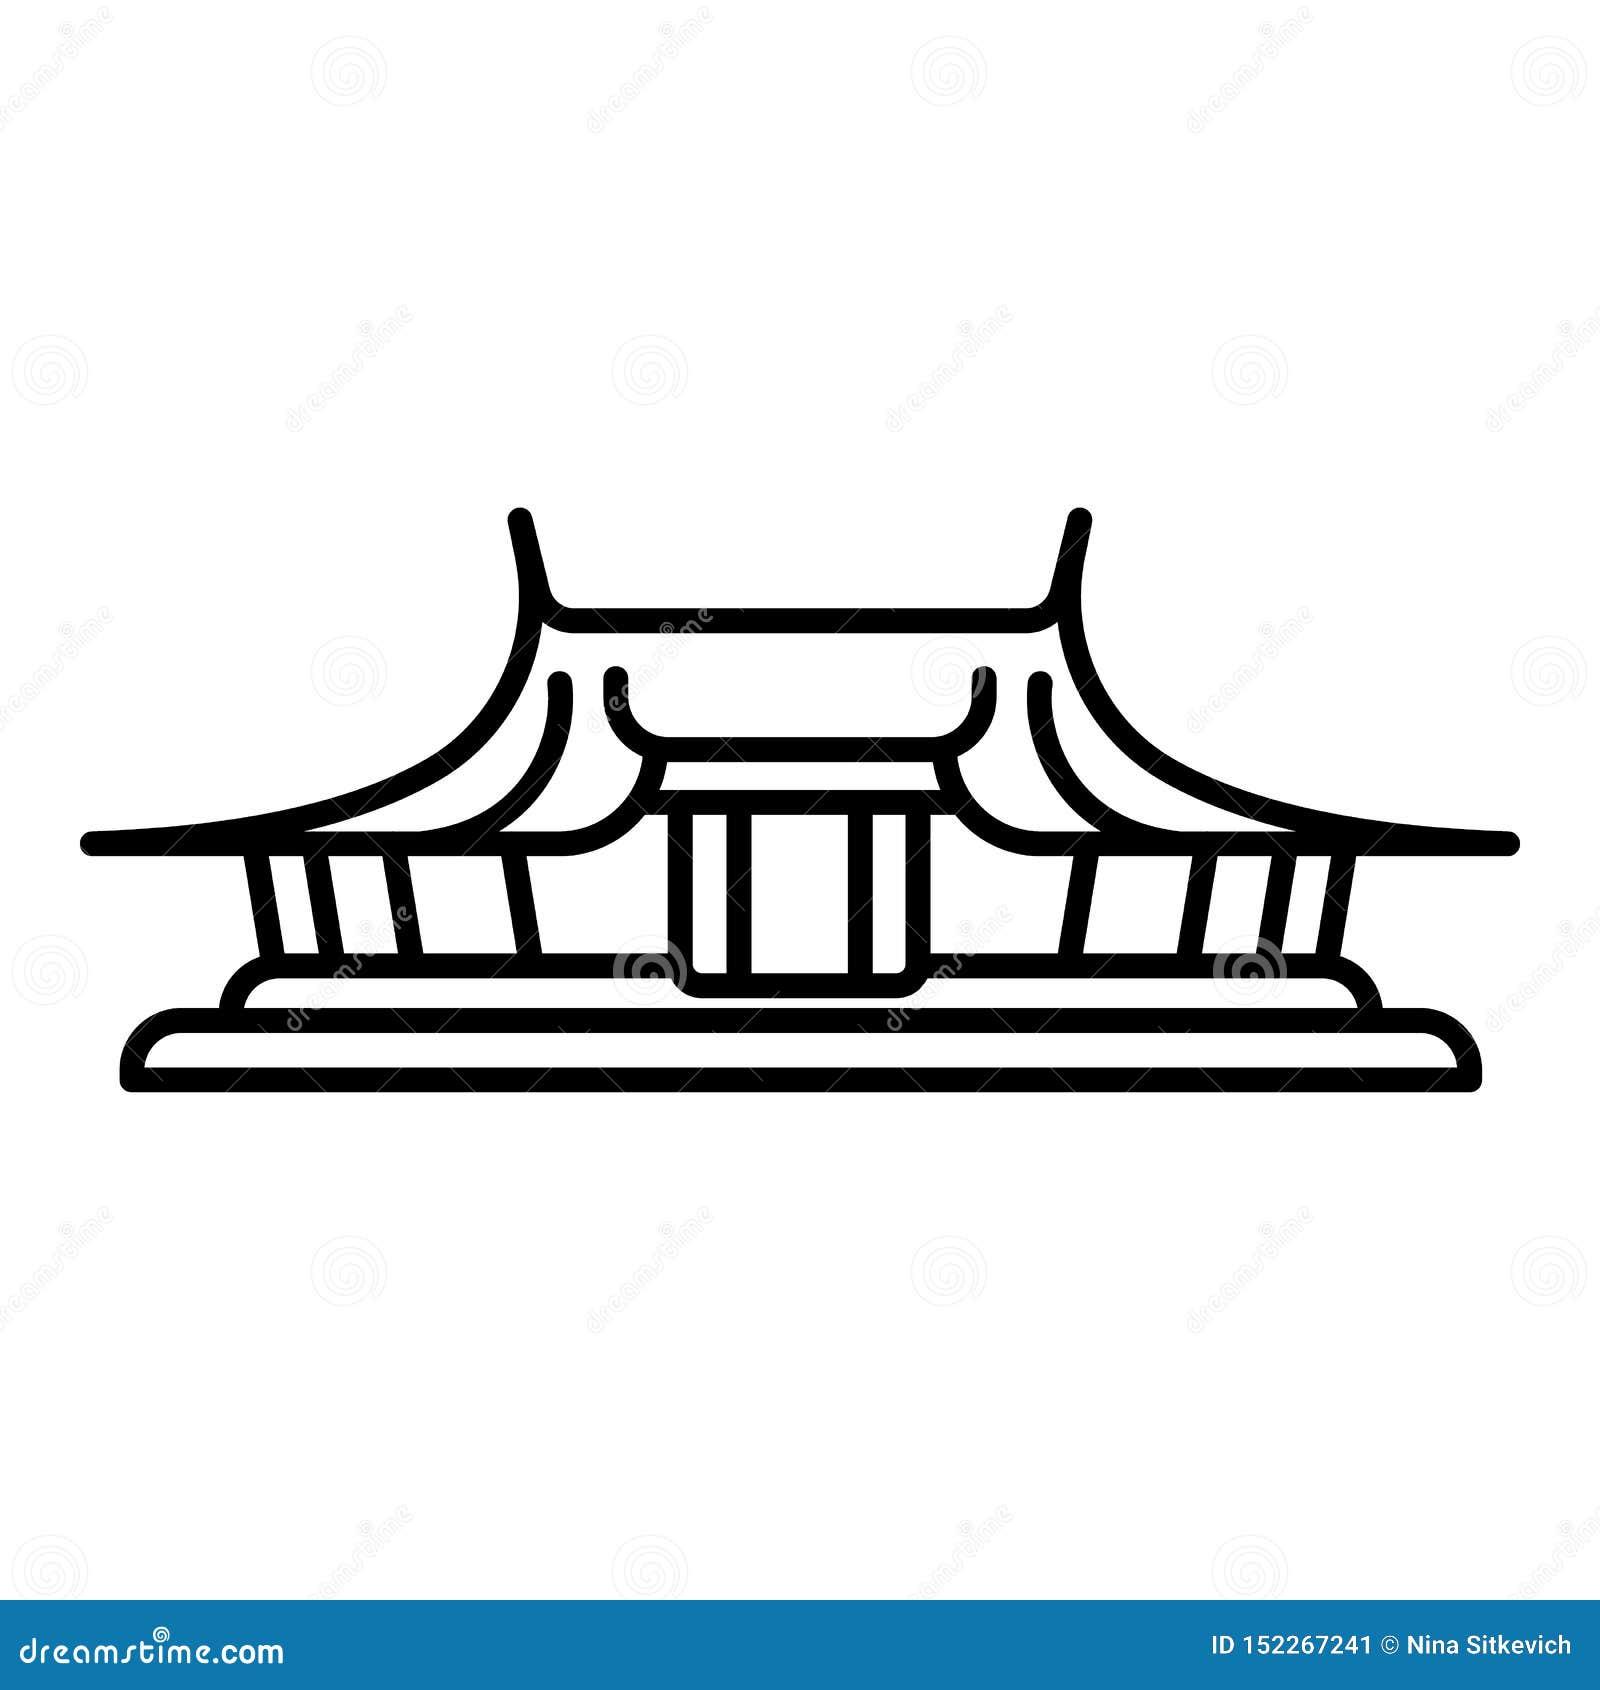 Taipei świątynna ikona, konturu styl